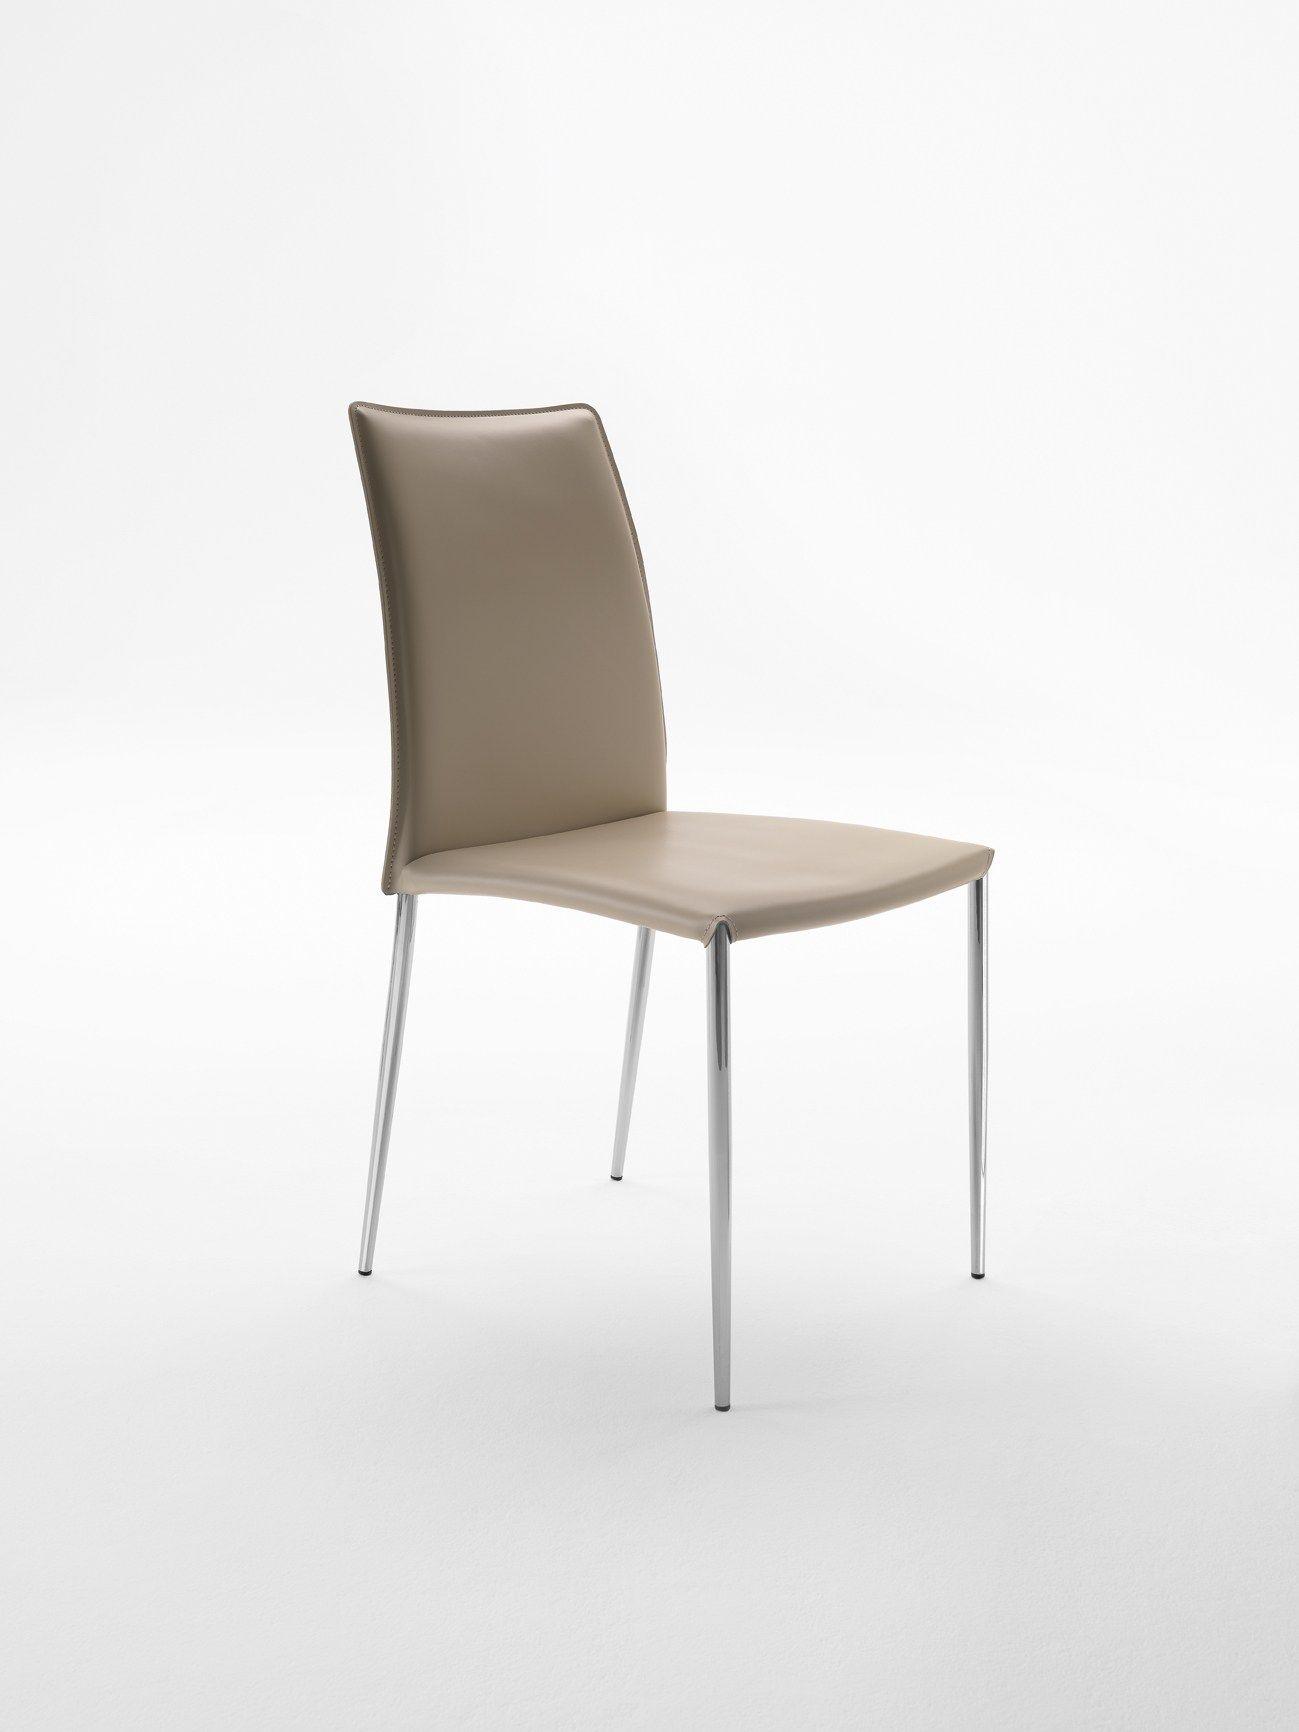 chaise rembourr e en cuir tann e delfina sr collection delfina by midj design studiokappa. Black Bedroom Furniture Sets. Home Design Ideas